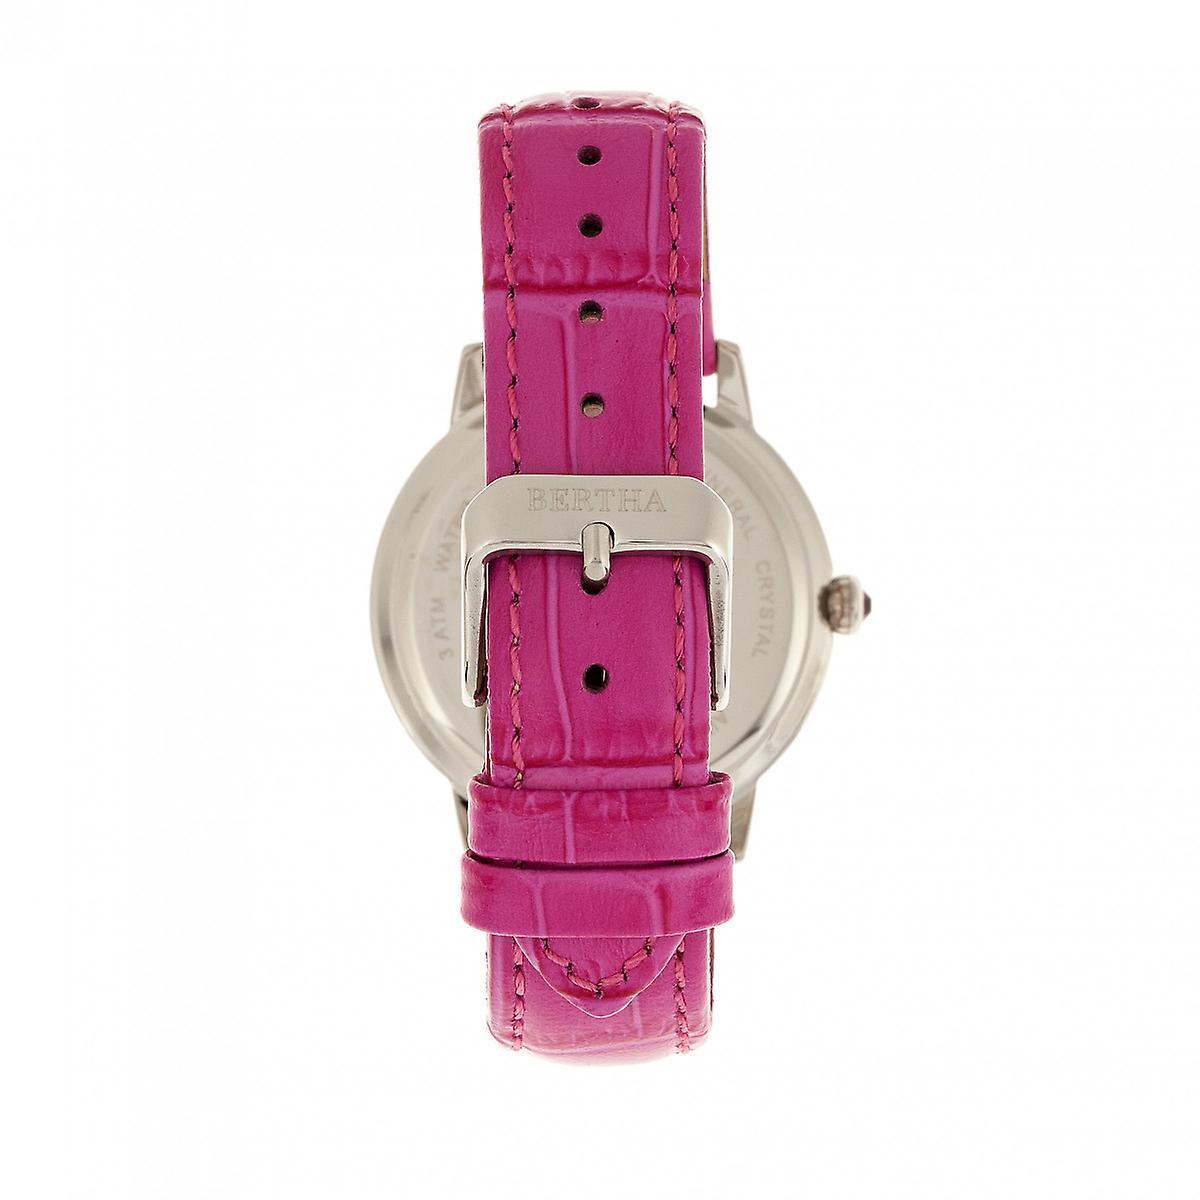 Bertha Madeline MOP Leder-Band Armbanduhr - Hot Pink